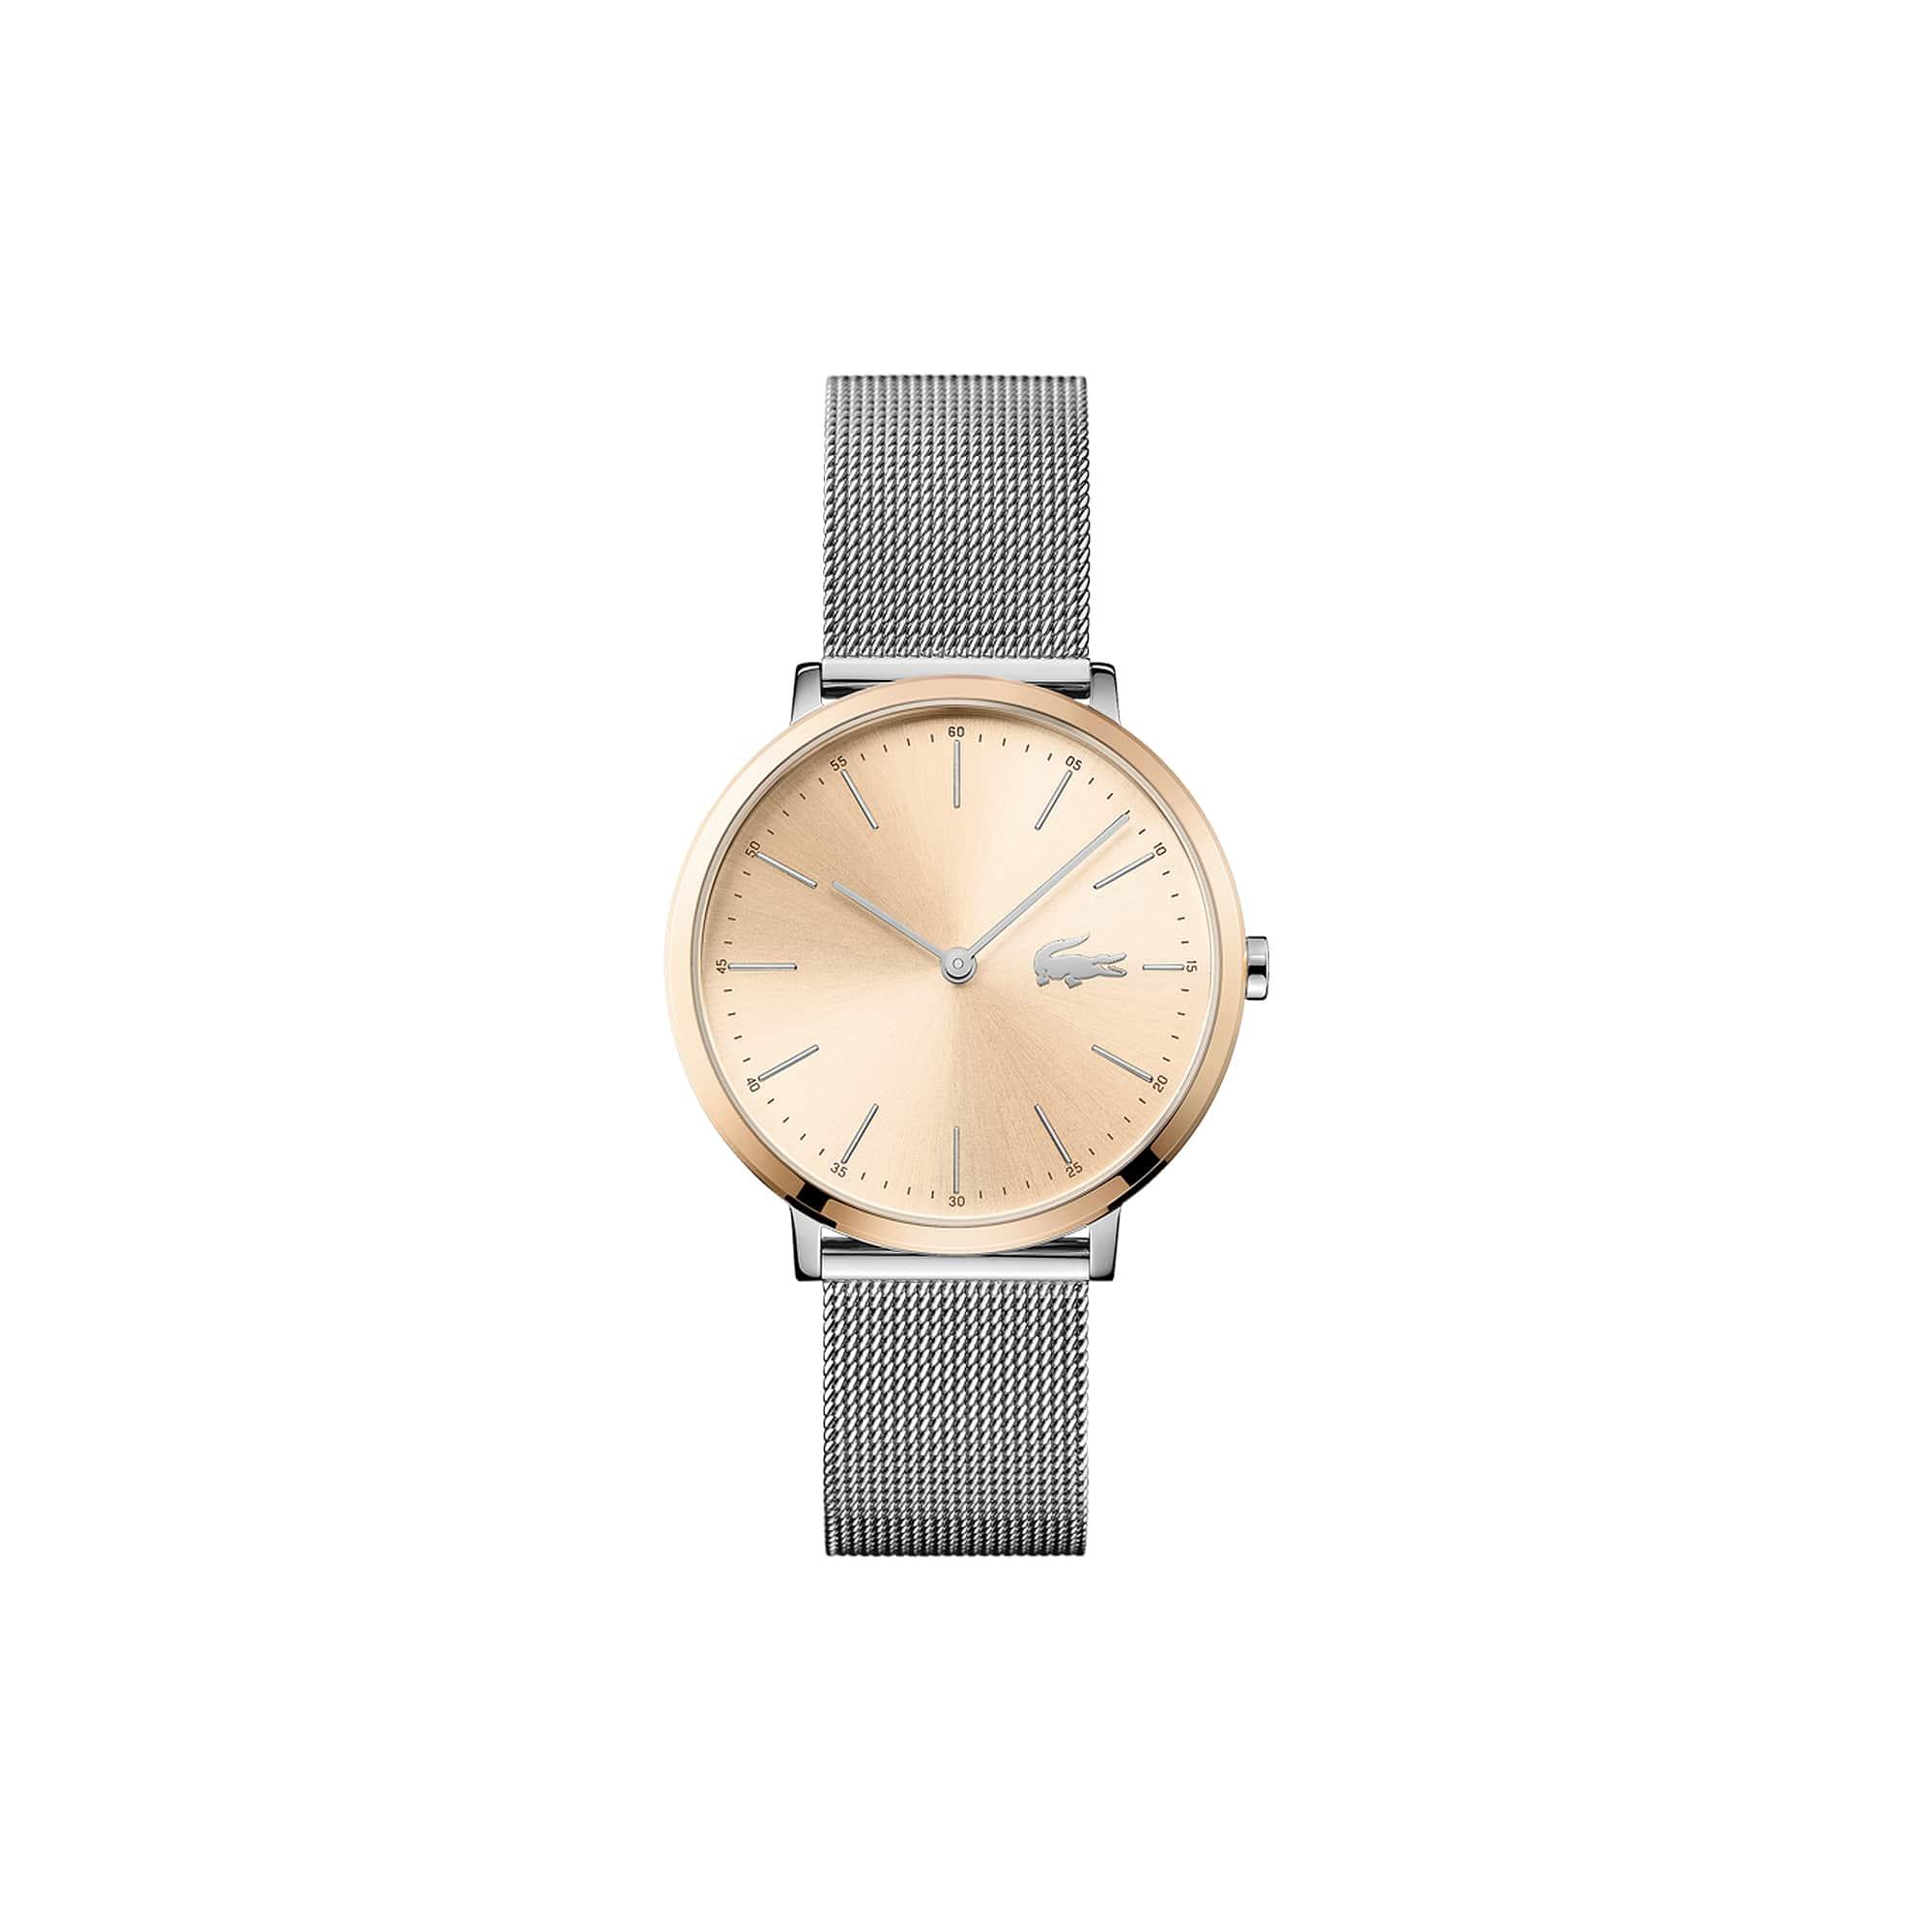 Women's Moon Ultra Slim Watch with Stainless Steel Mesh Bracelet